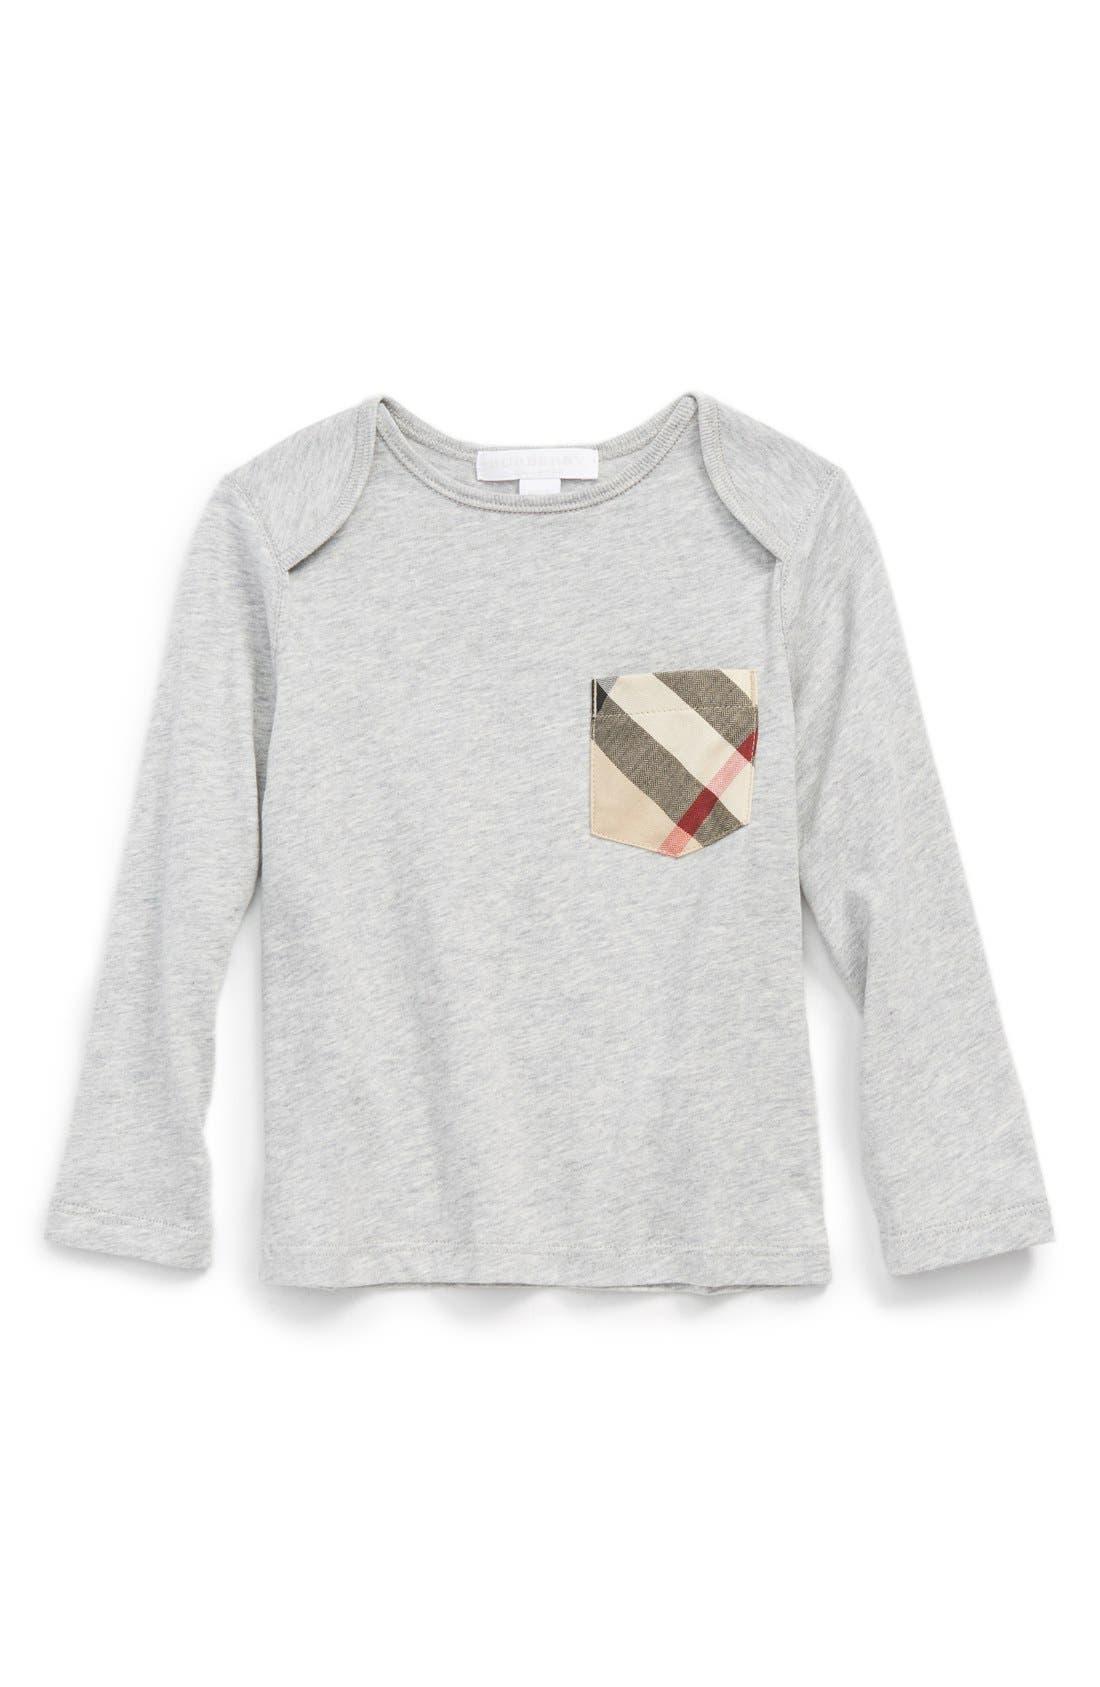 'Callum' Check Print Chest Pocket T-Shirt,                             Main thumbnail 1, color,                             035